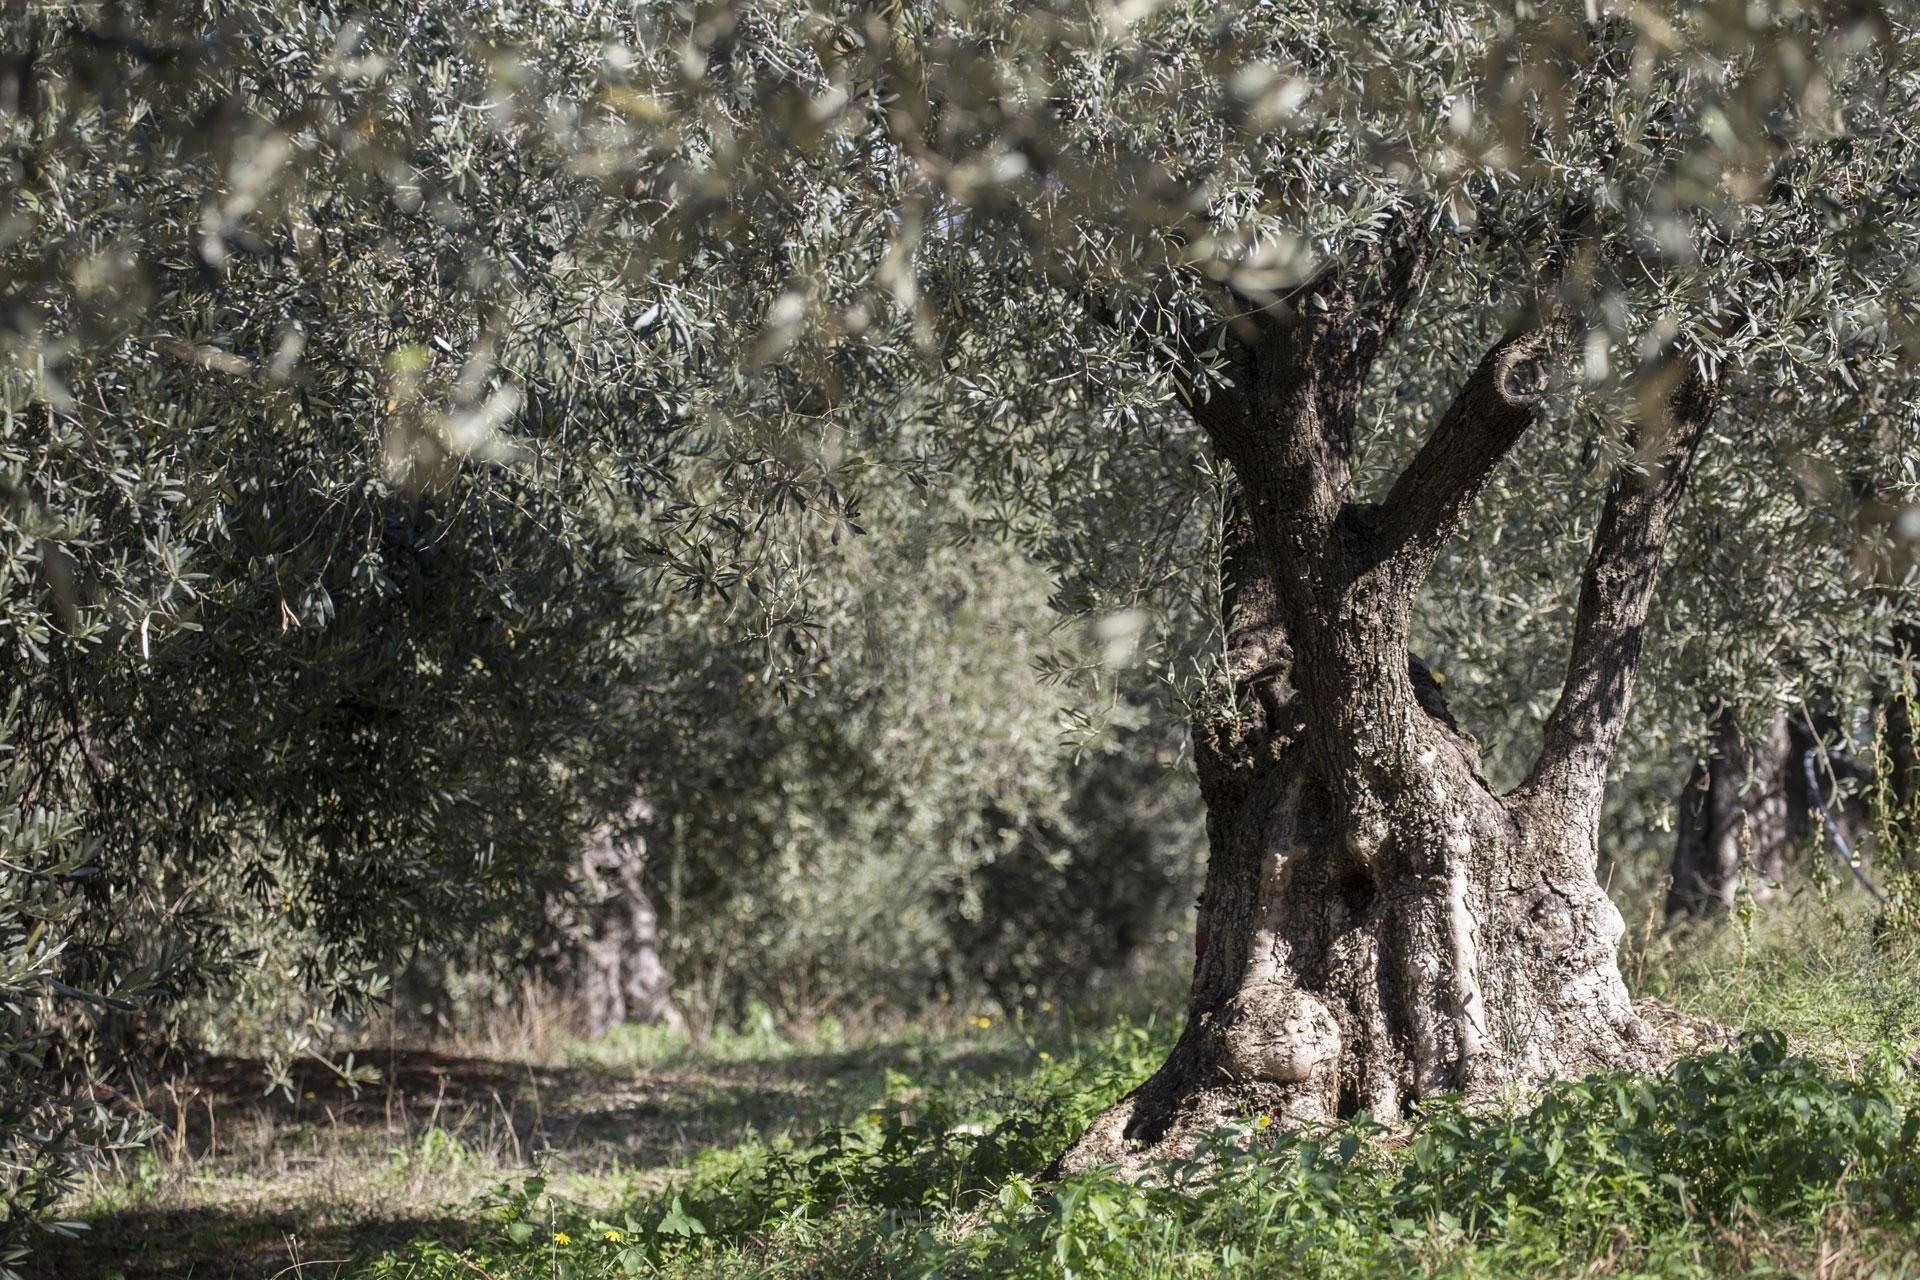 Classic αγνό Ελαιόλαδο Greenolia - Δεντρο ελιας